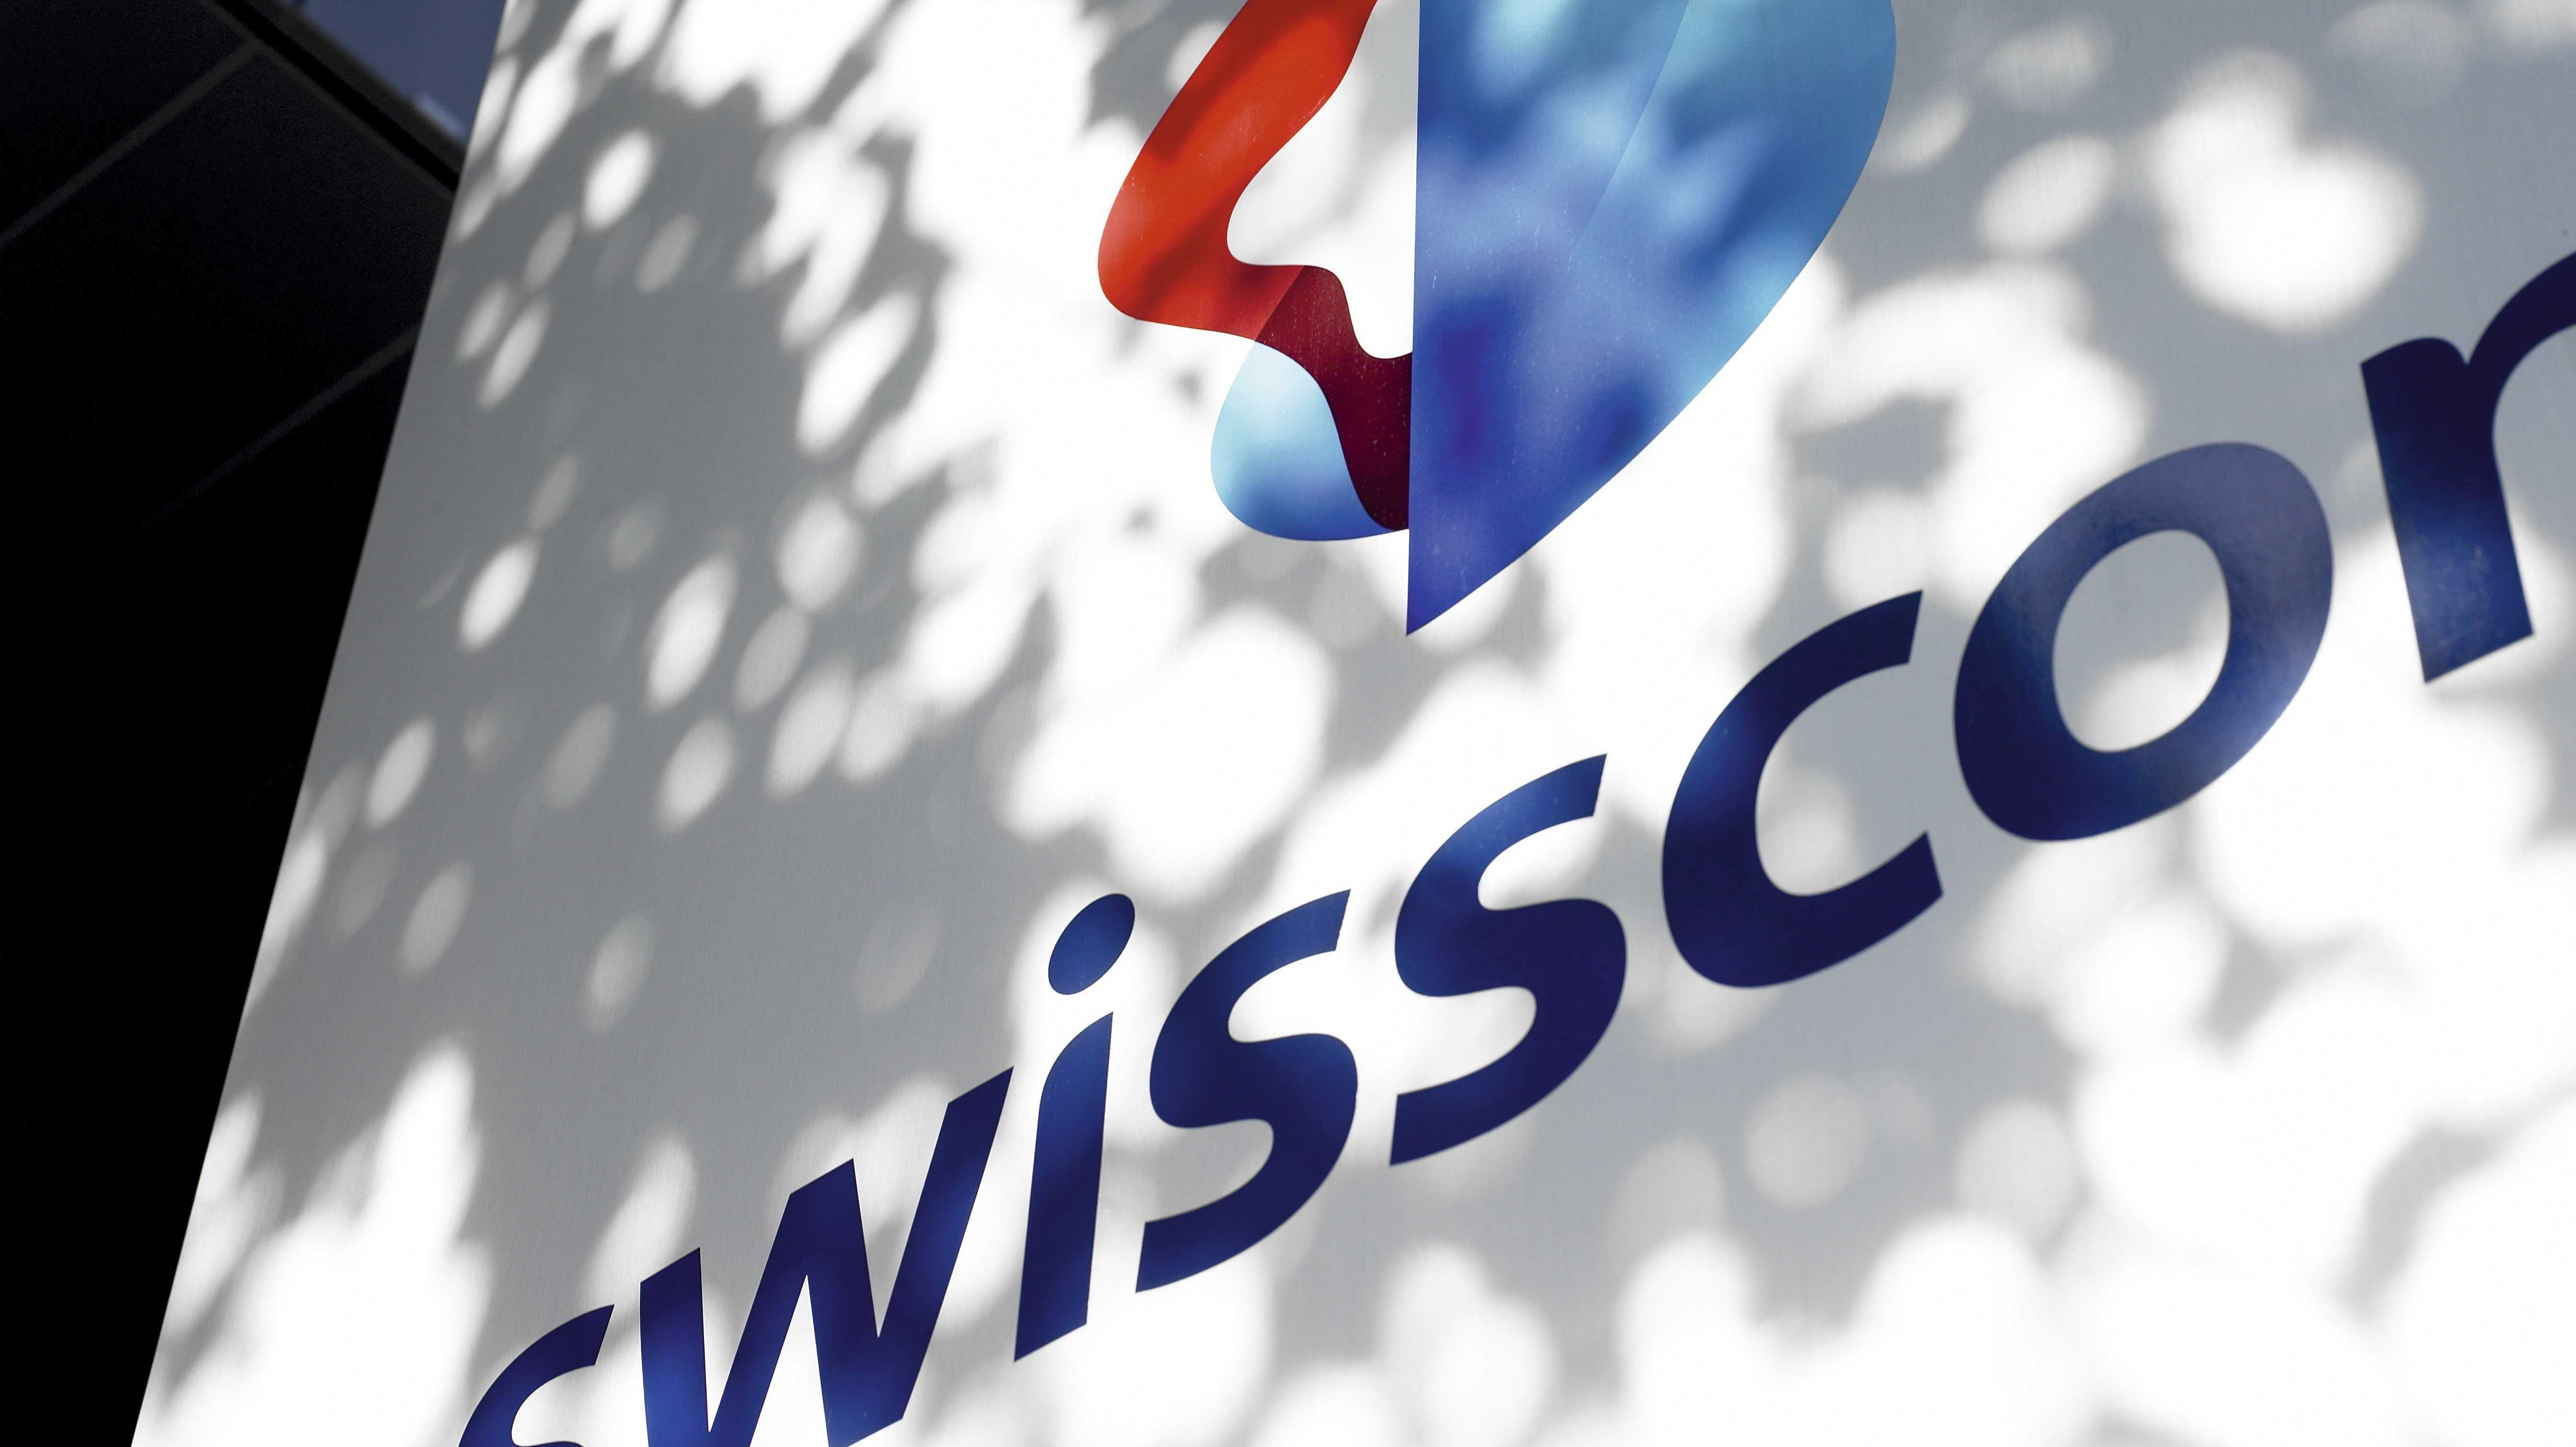 Swisscom überträgt 1 Gbit/s im Mobilfunknetz